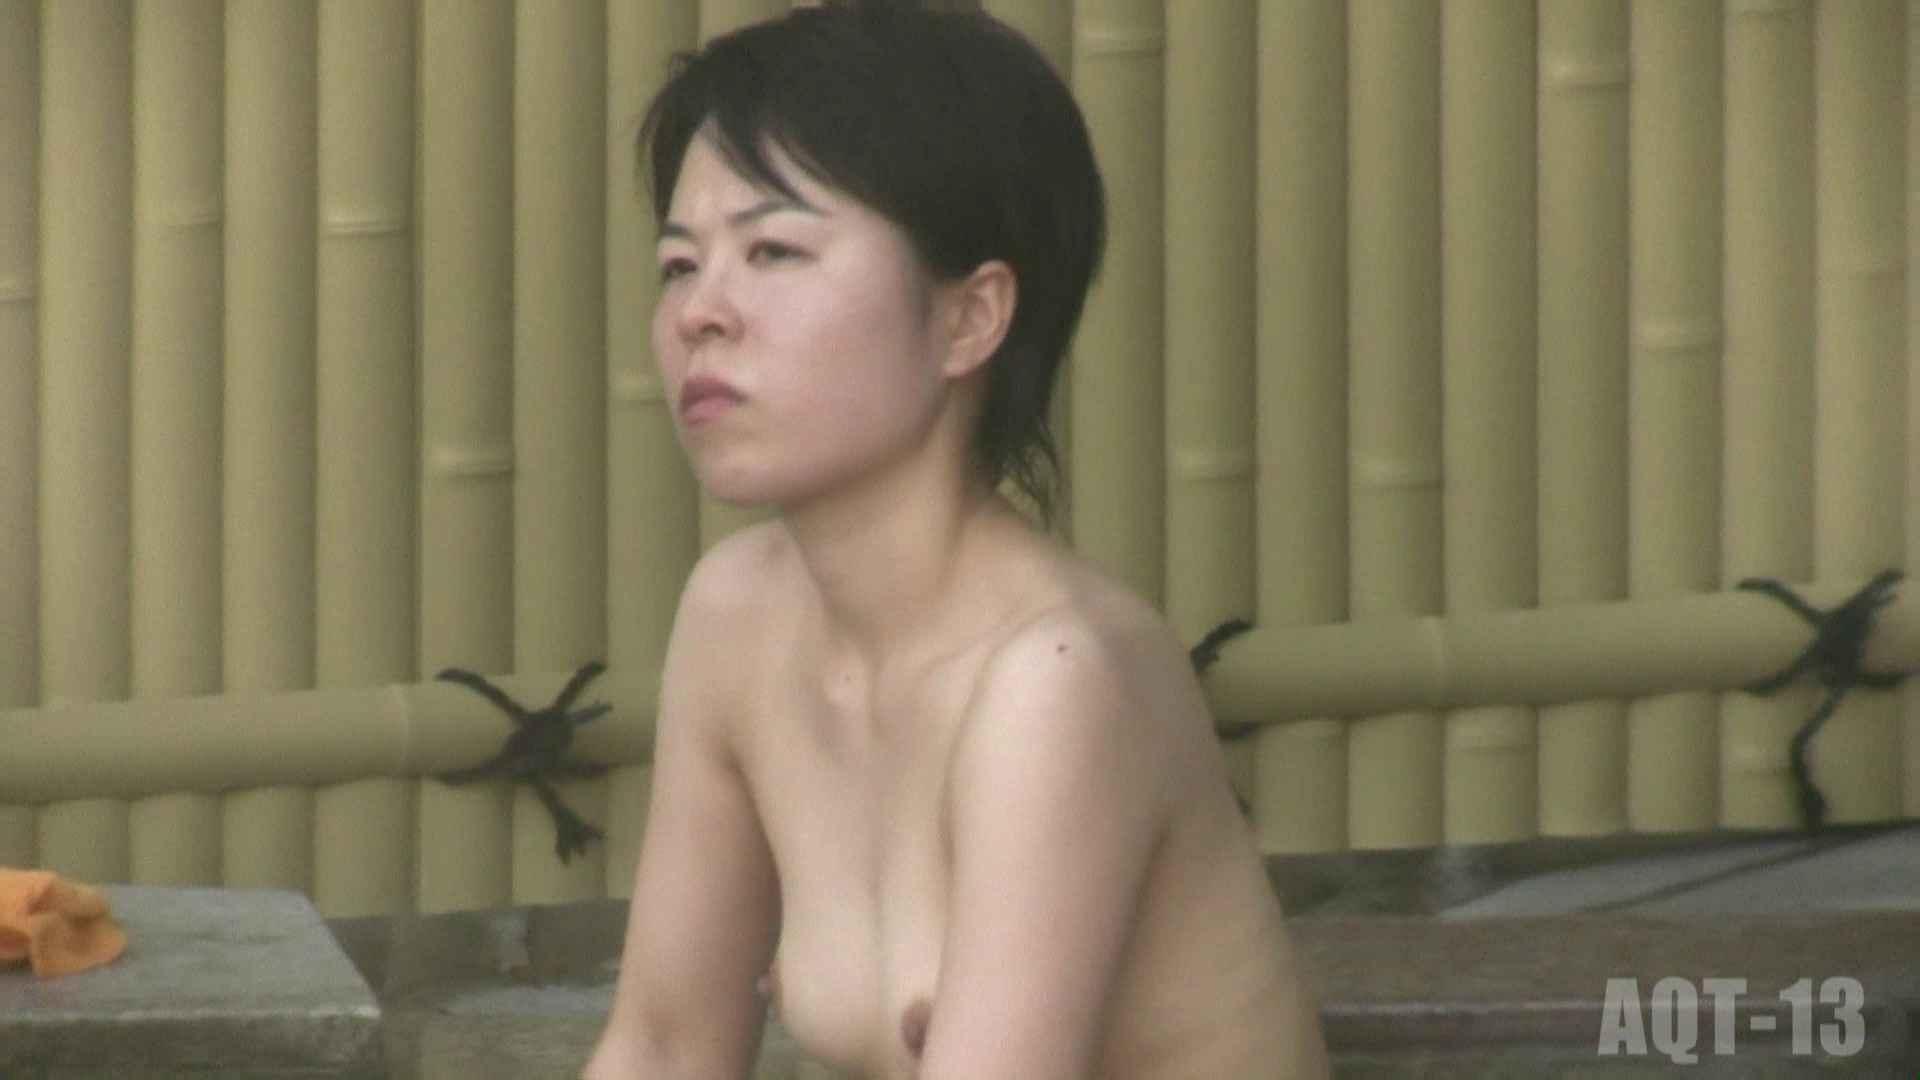 Aquaな露天風呂Vol.815 盗撮  109連発 87